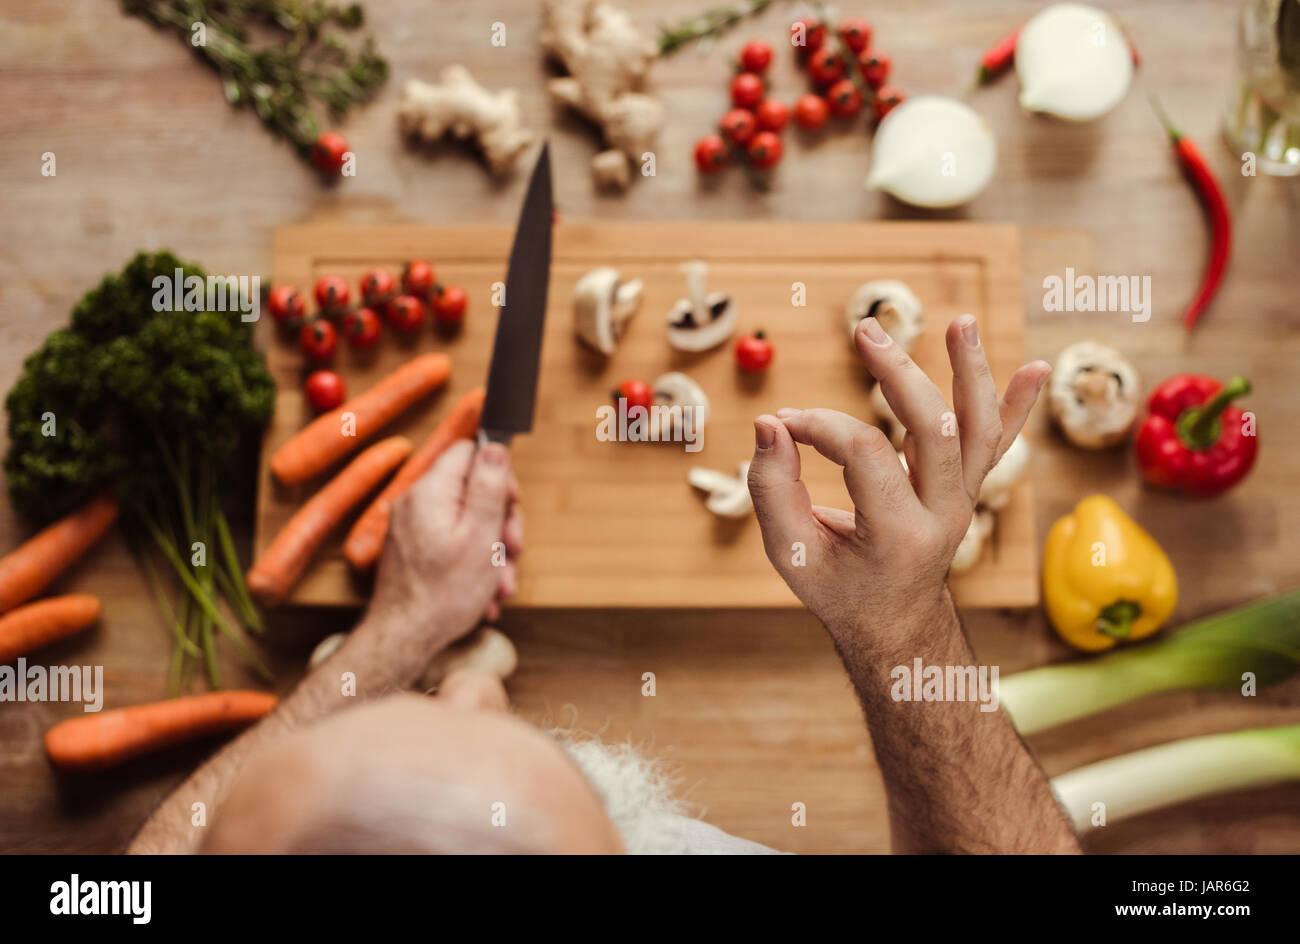 Hombre preparar comida vegetariana Imagen De Stock